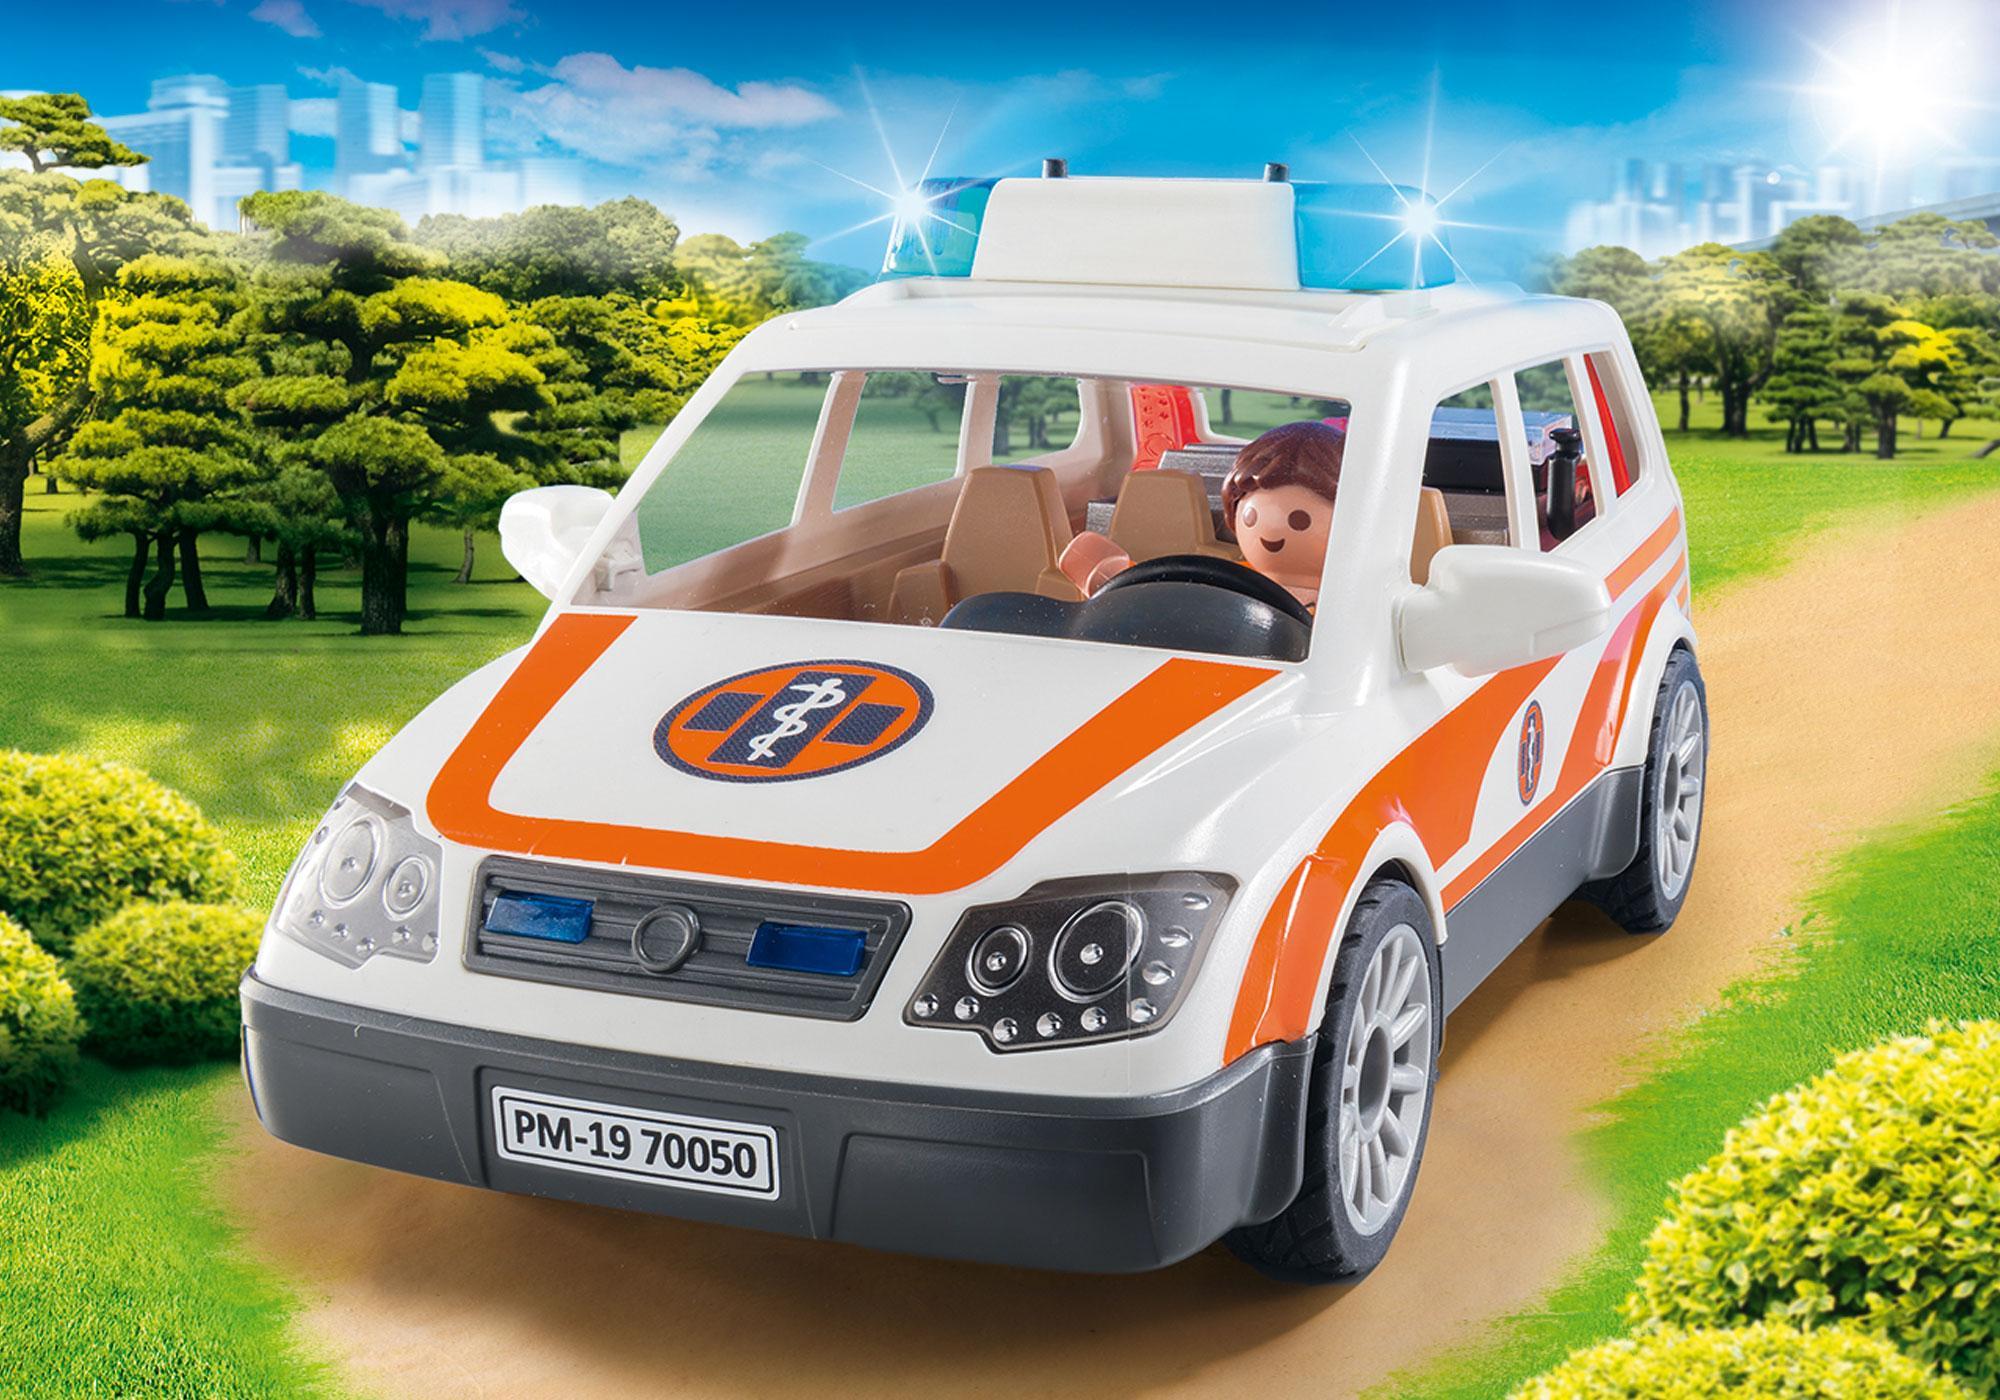 http://media.playmobil.com/i/playmobil/70050_product_extra3/Automedica con sirena